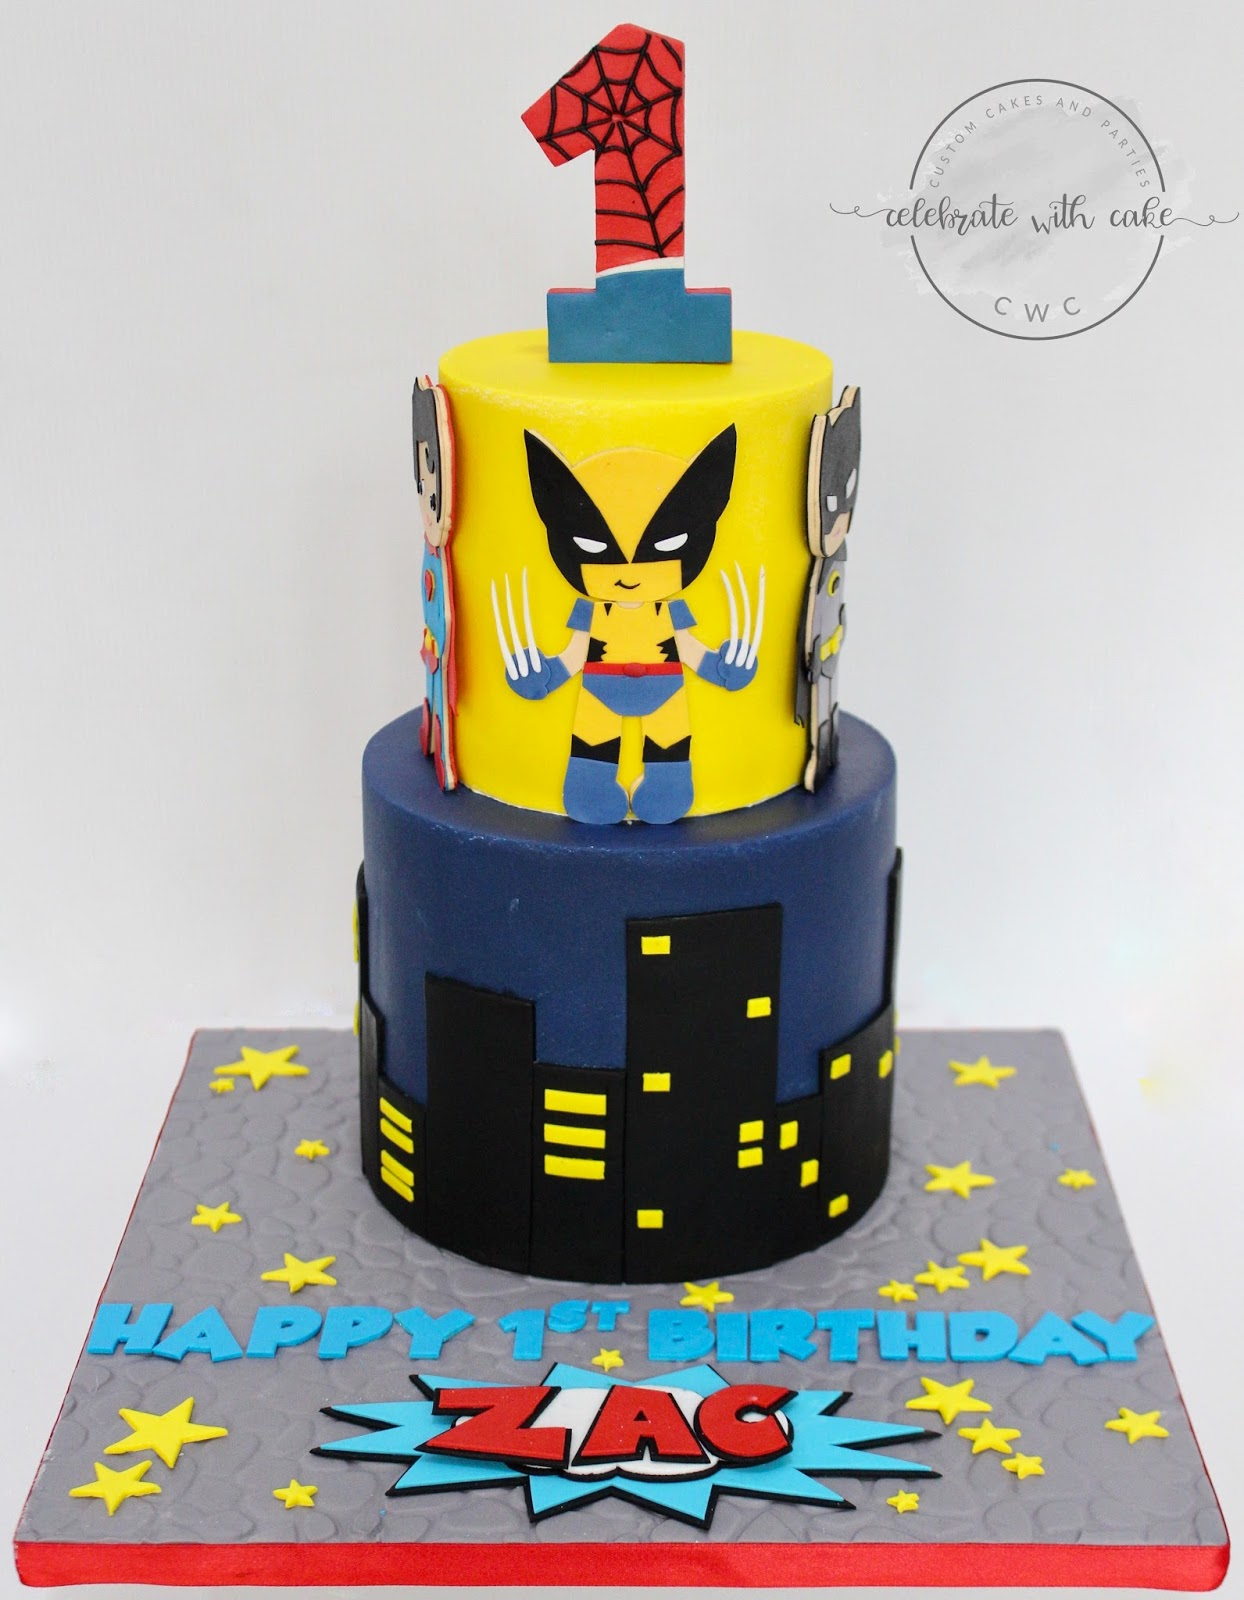 Cool Celebrate With Cake Superheros Featuring Wolverine 2 Tiers Cake Personalised Birthday Cards Veneteletsinfo